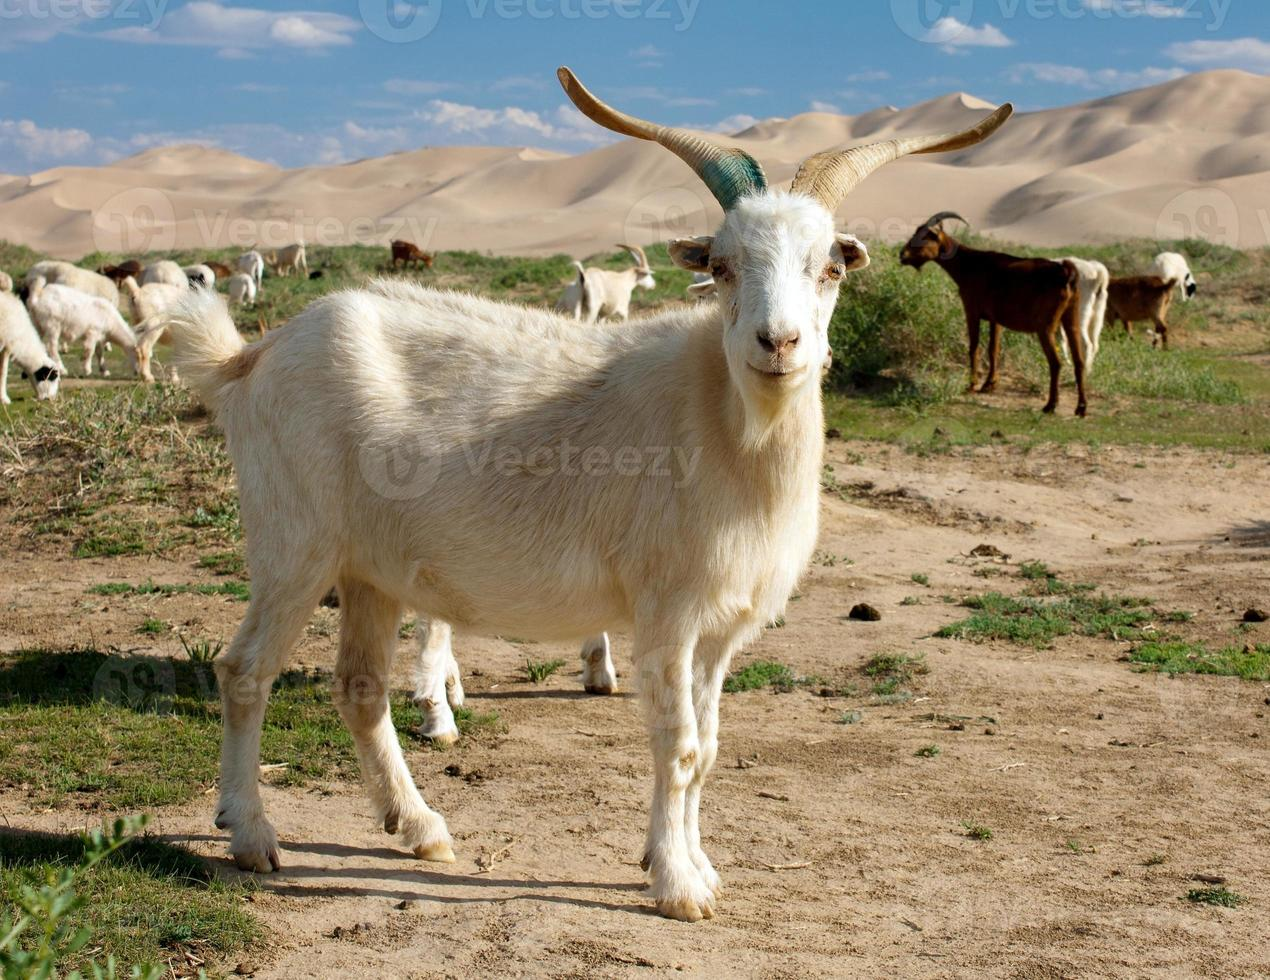 duna di capra deserto mongolia foto